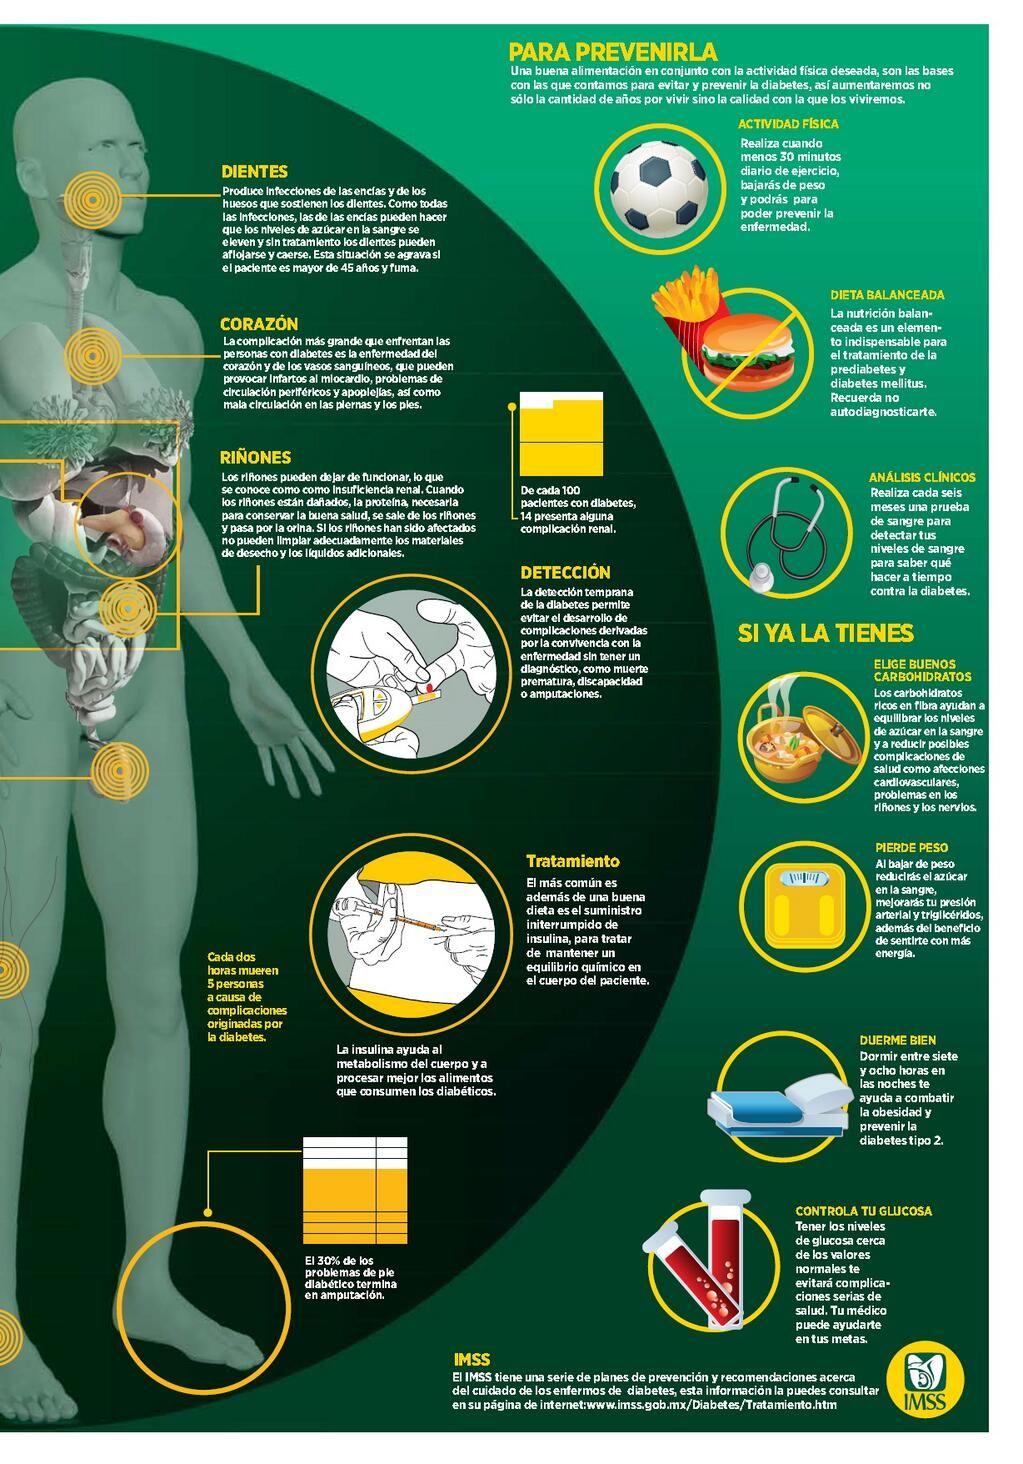 niveles de prevención para la diabetes mellitus